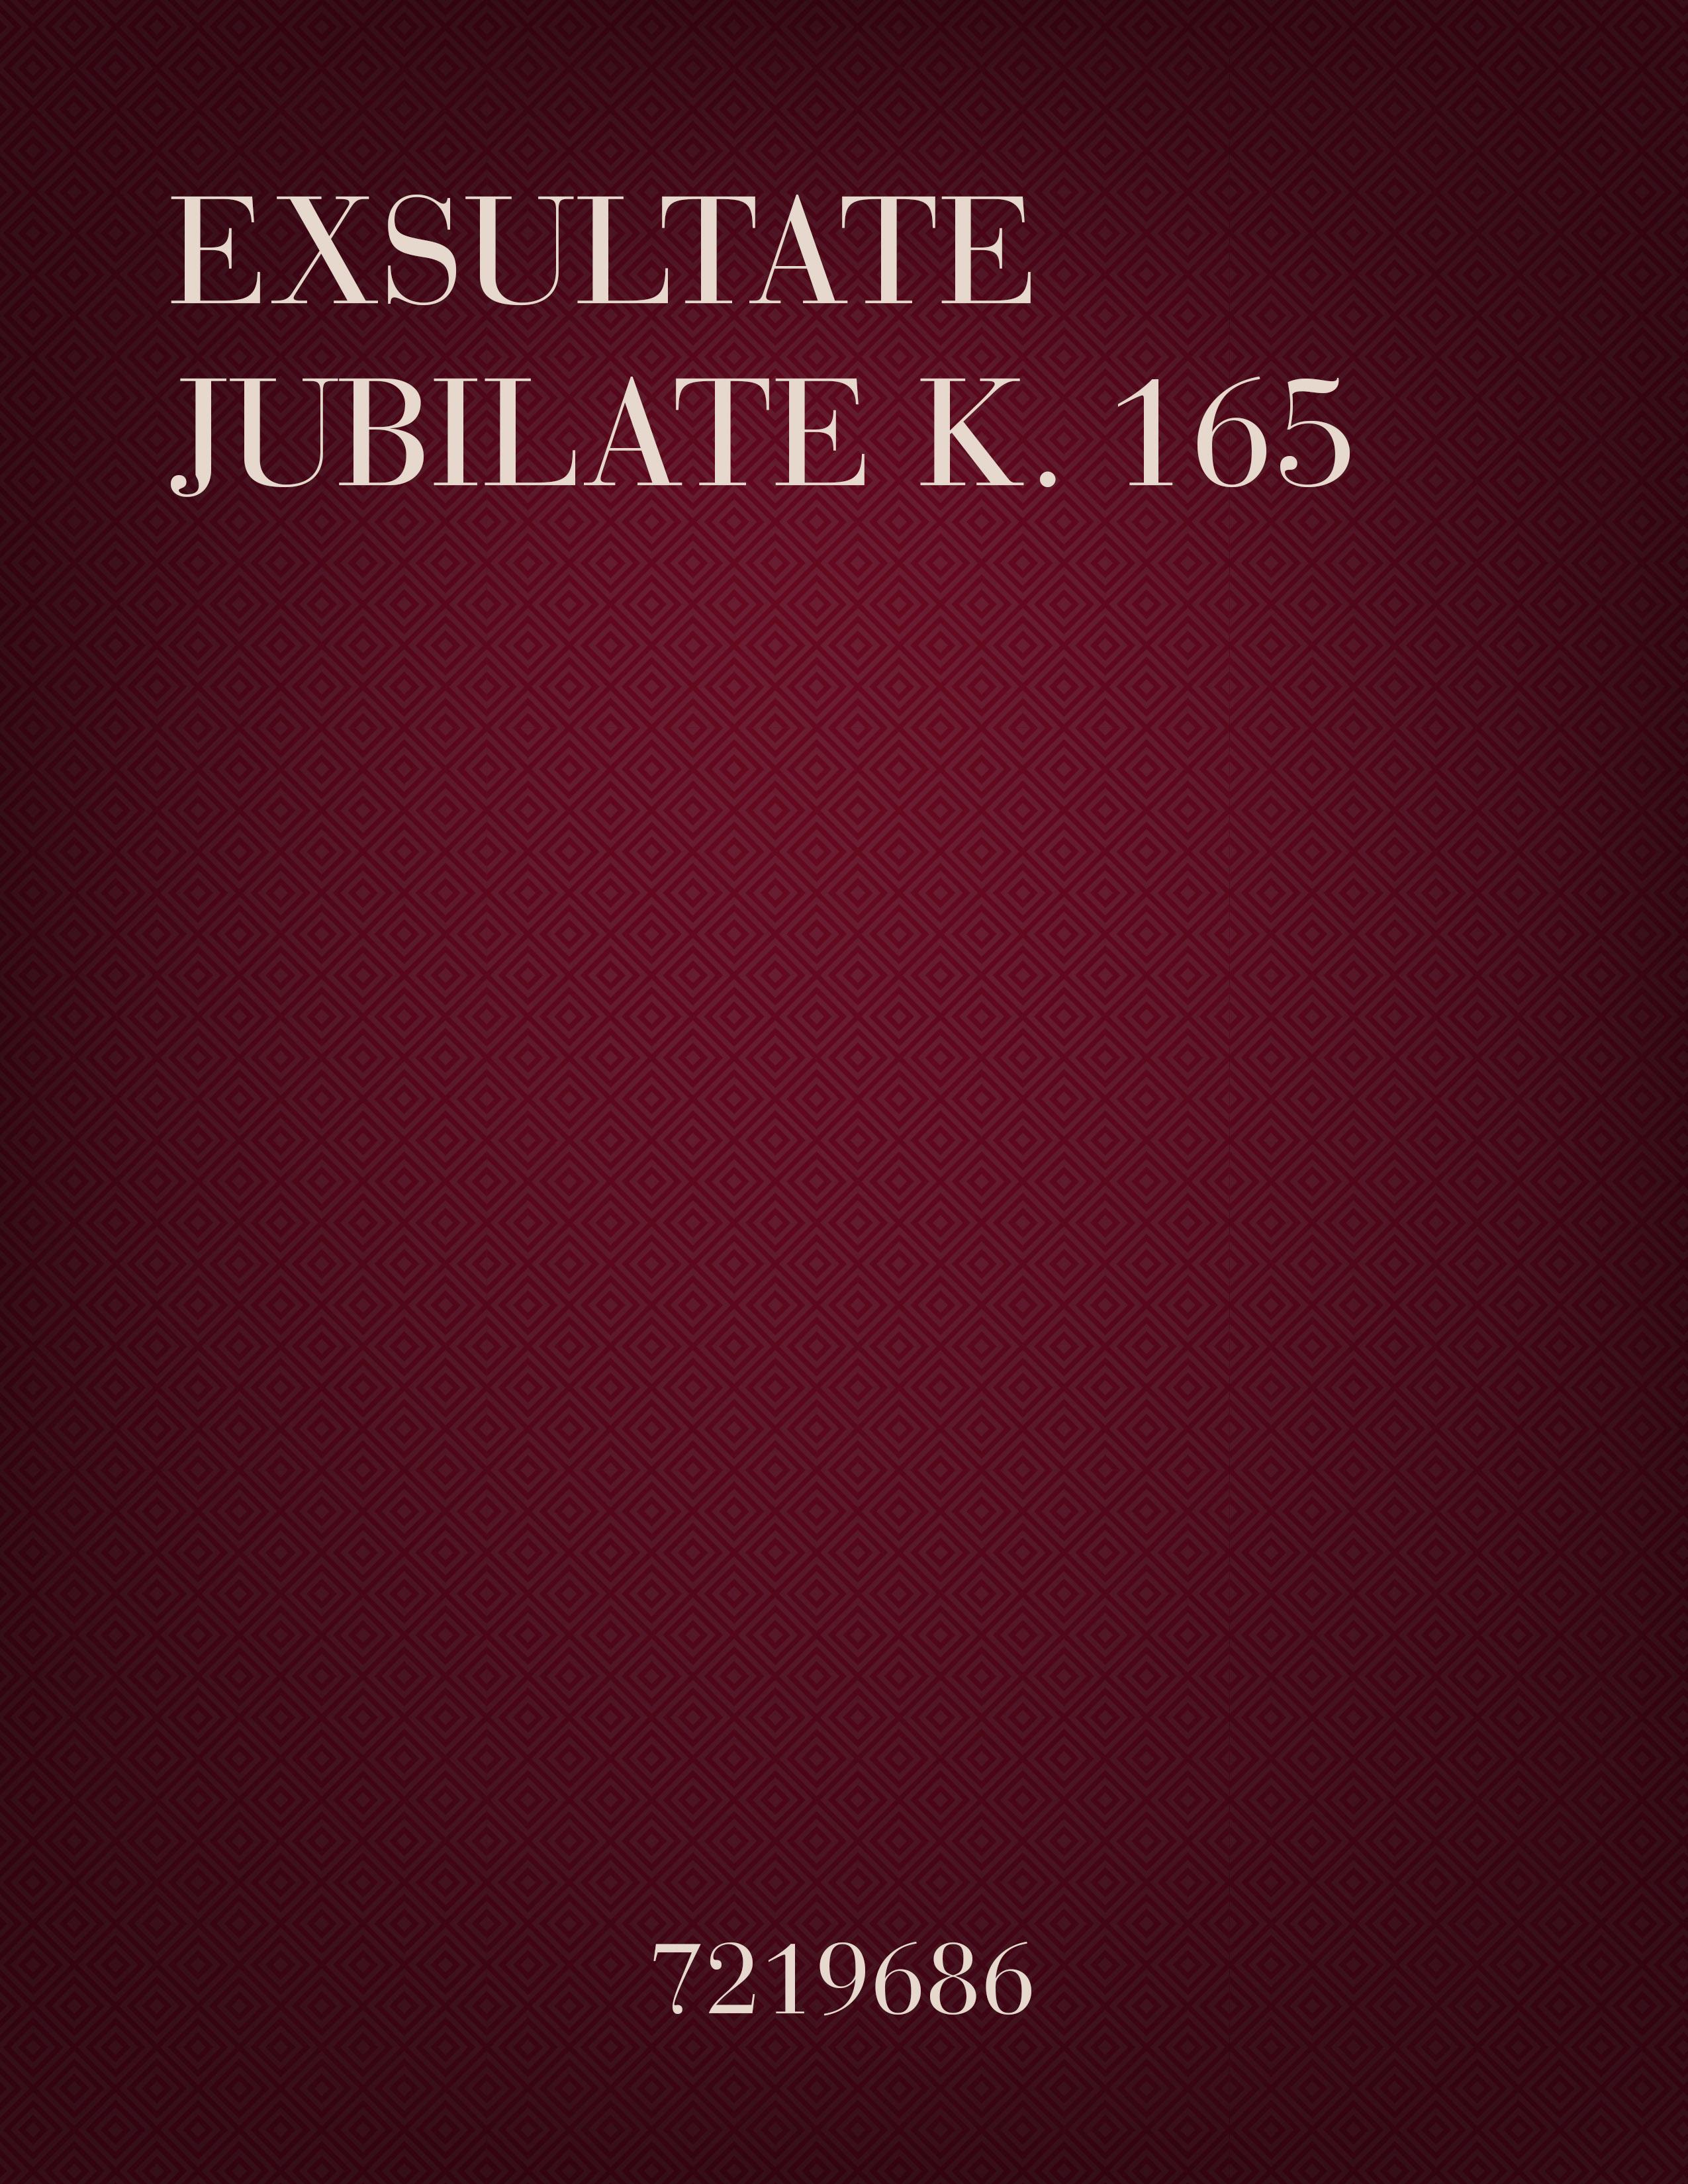 Exsultate Jubilate K. 165